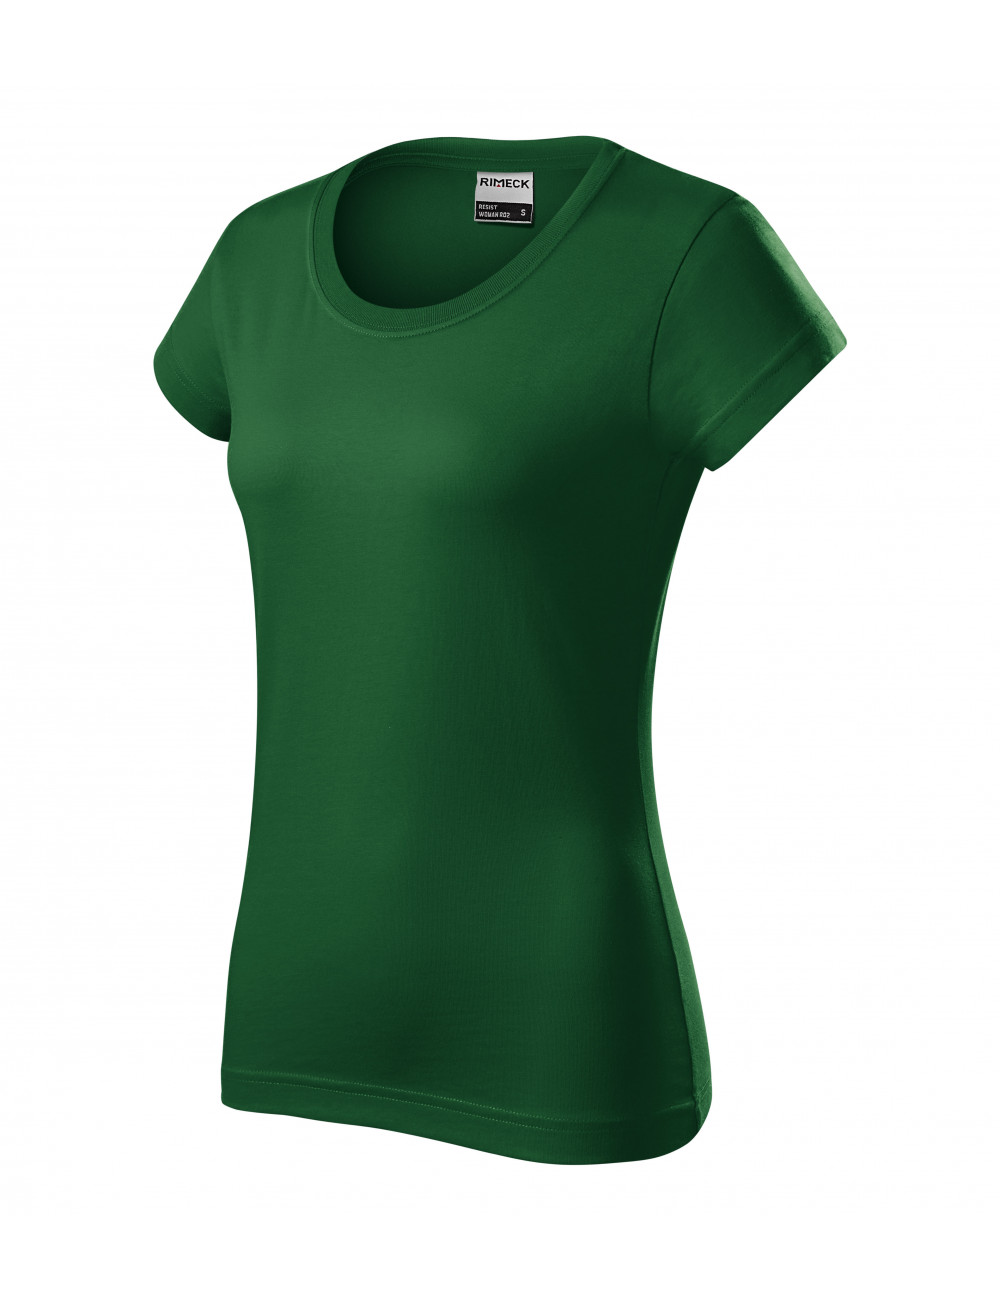 Adler RIMECK Koszulka damska Resist R02 zieleń butelkowa